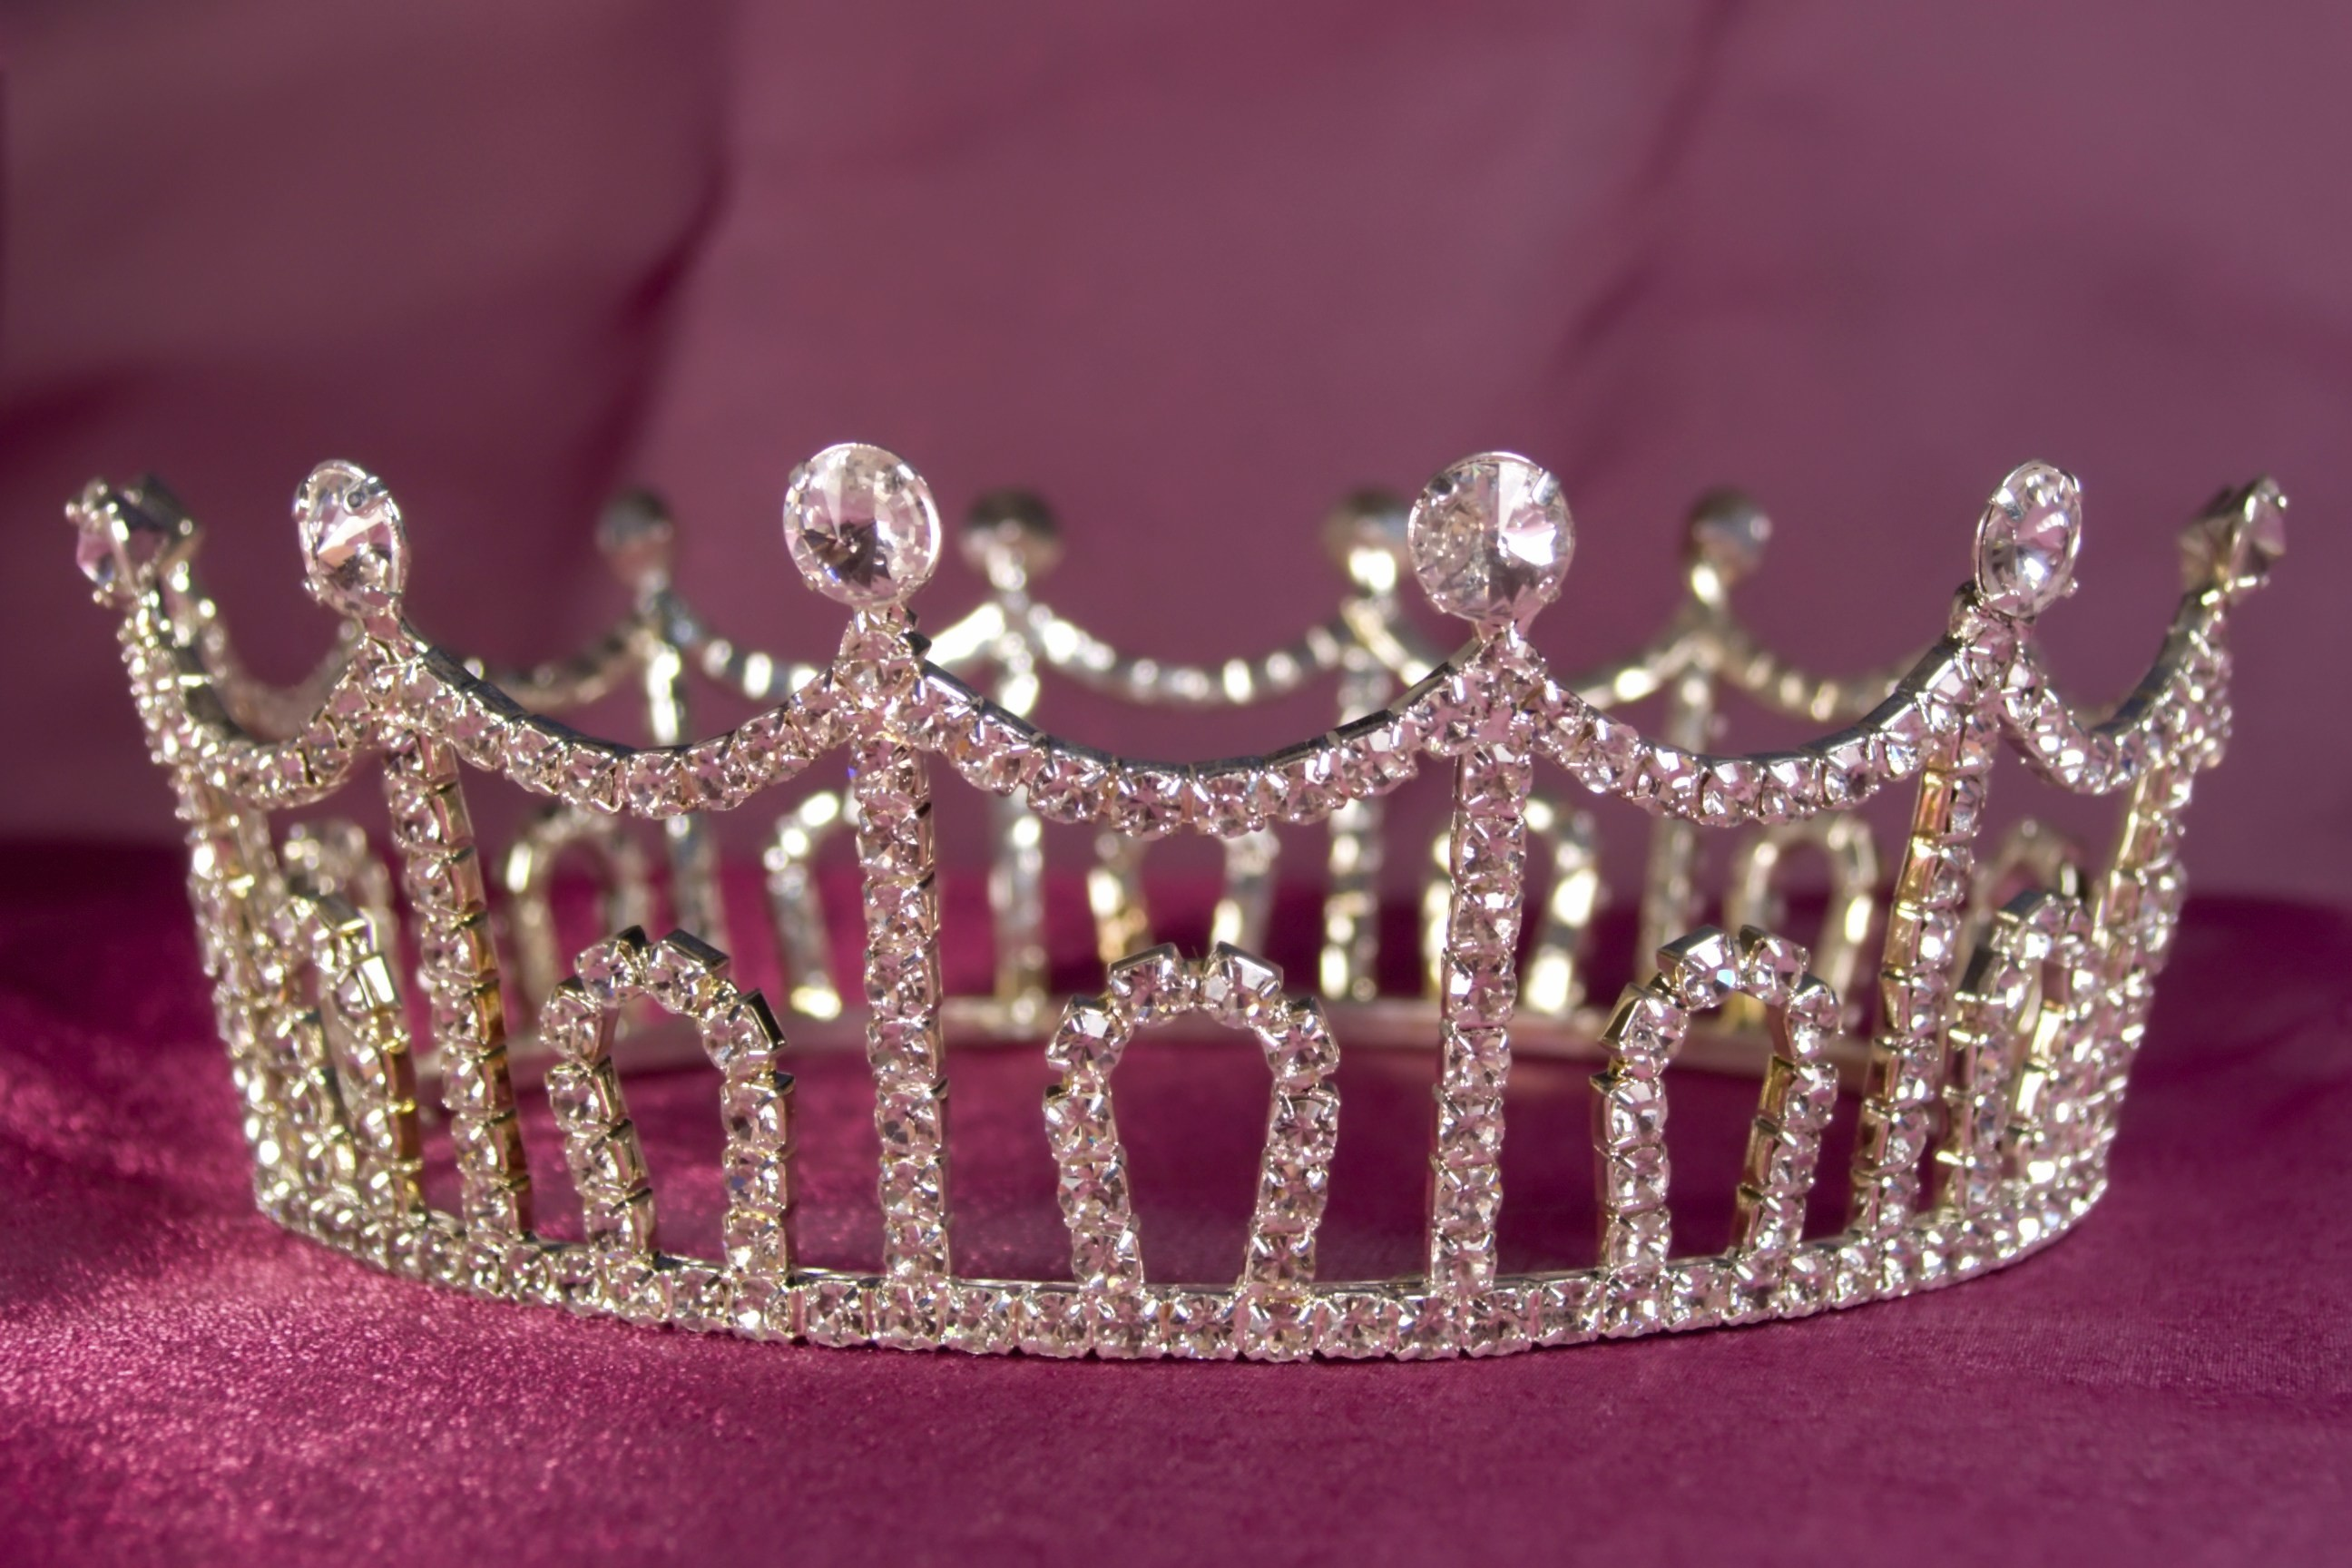 Princess Crown Wallpaper (48+ images)